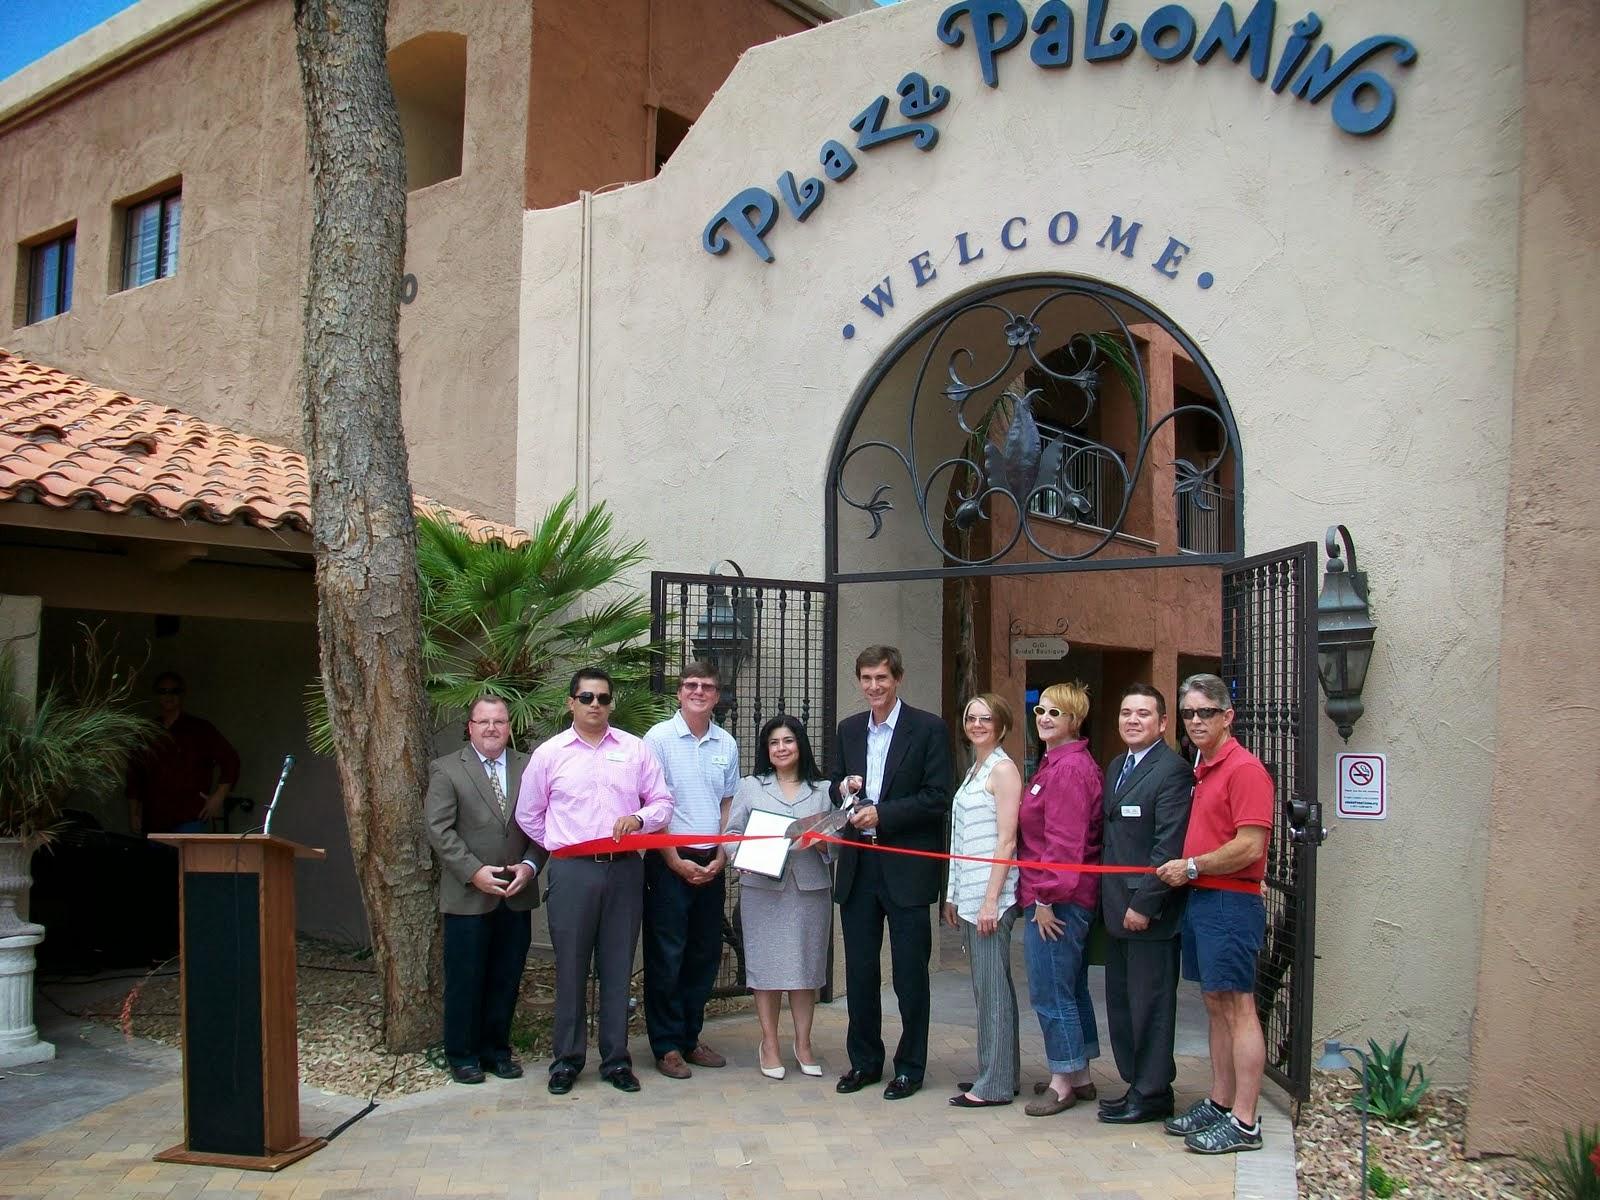 Plaza Palamino Merchants Association